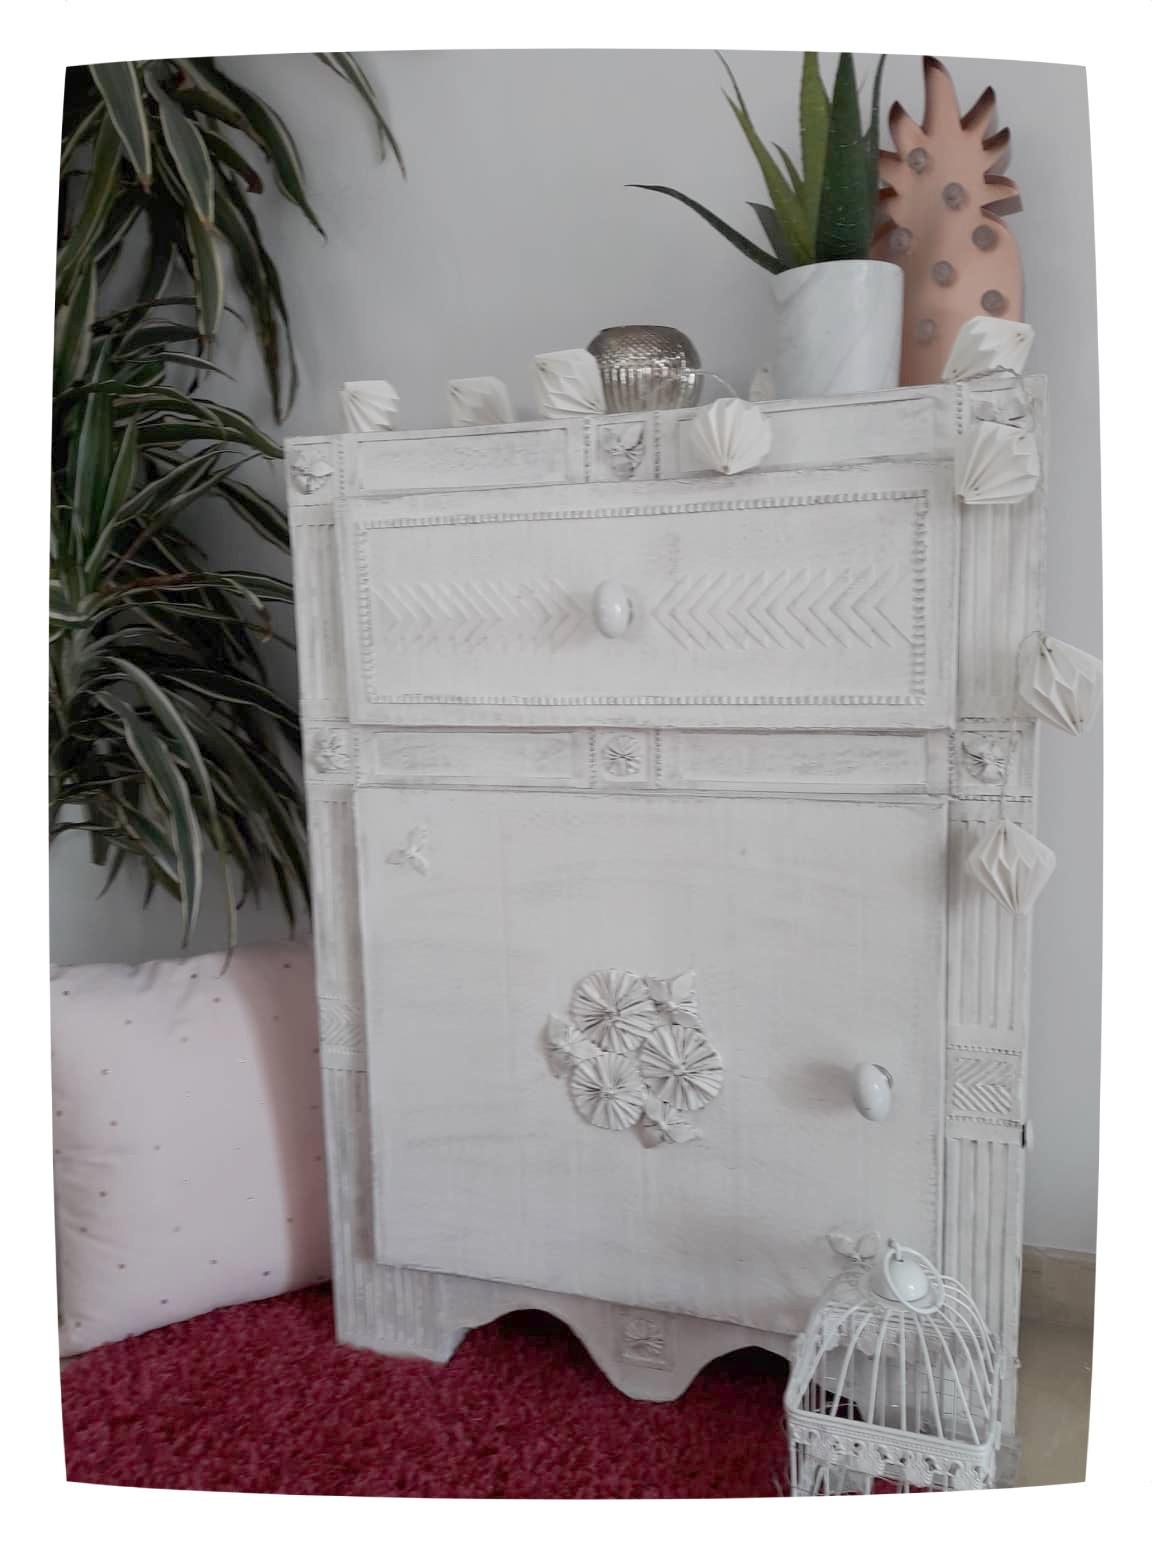 Image De Meuble En Carton qui peut faire un meuble en carton? avec quoi? - mon univers